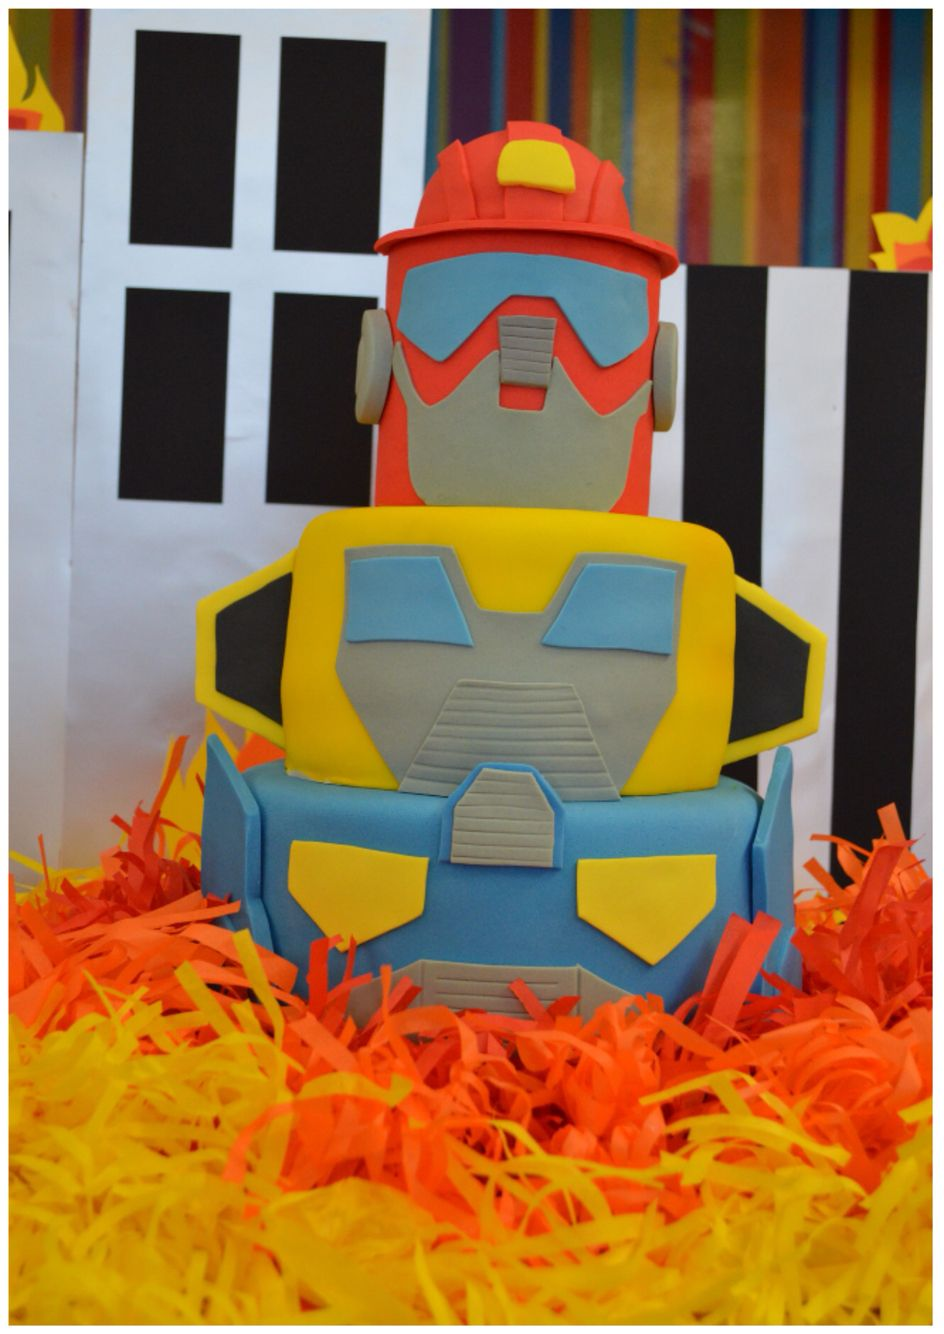 Transformers Rescue Bots Diy Party Ideas Birthday Cake Diy